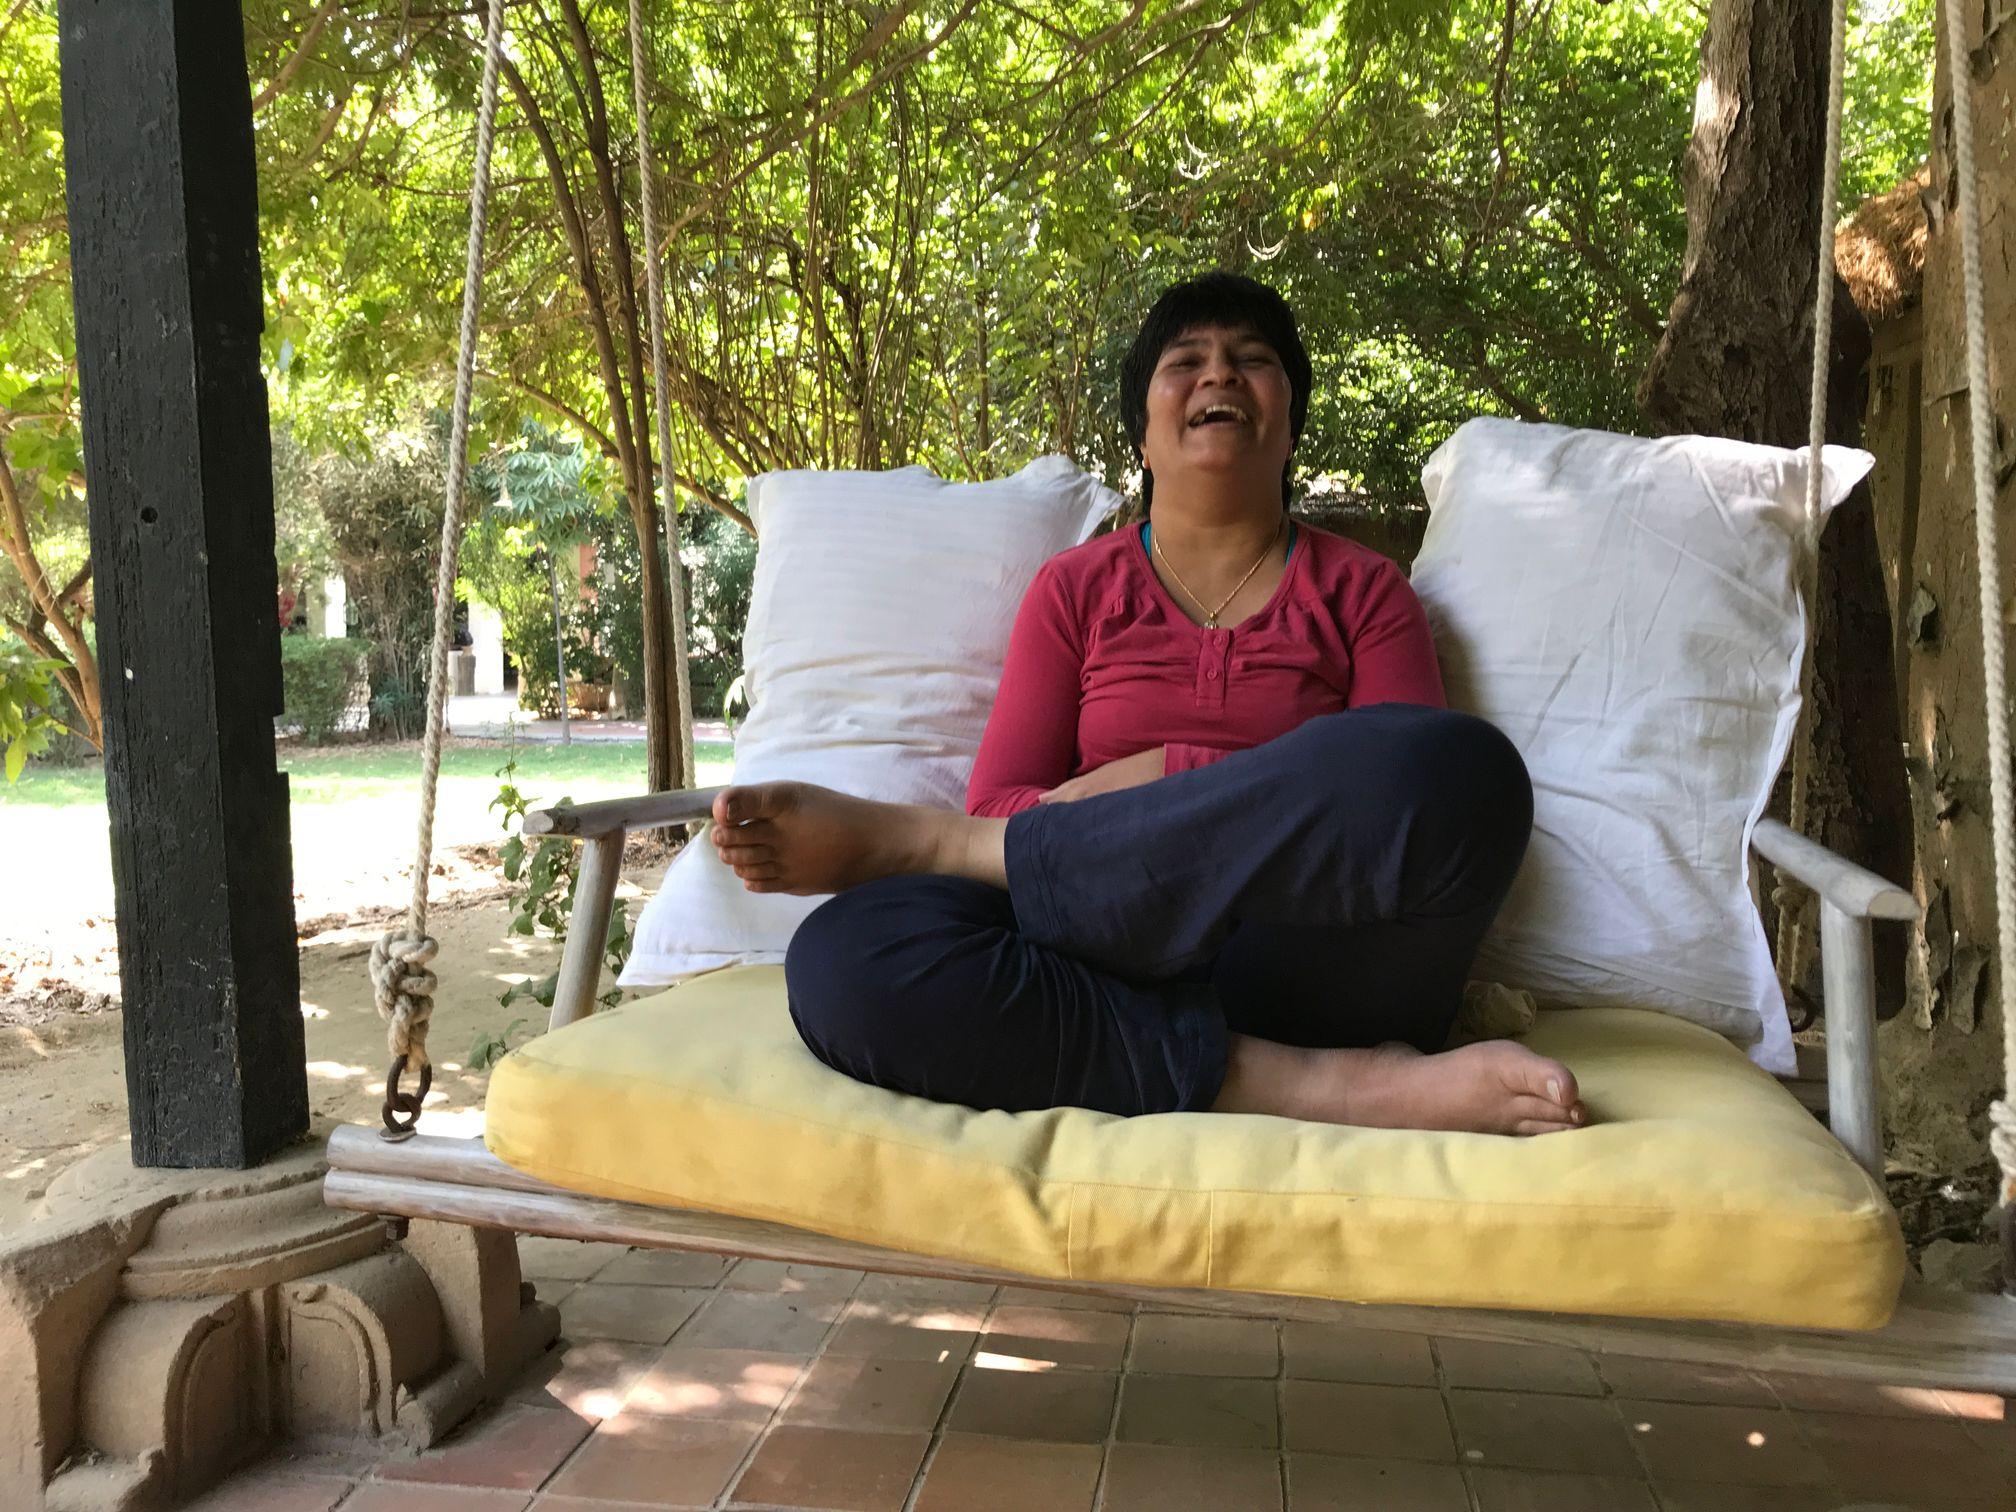 Jagu enjoys the swing seat